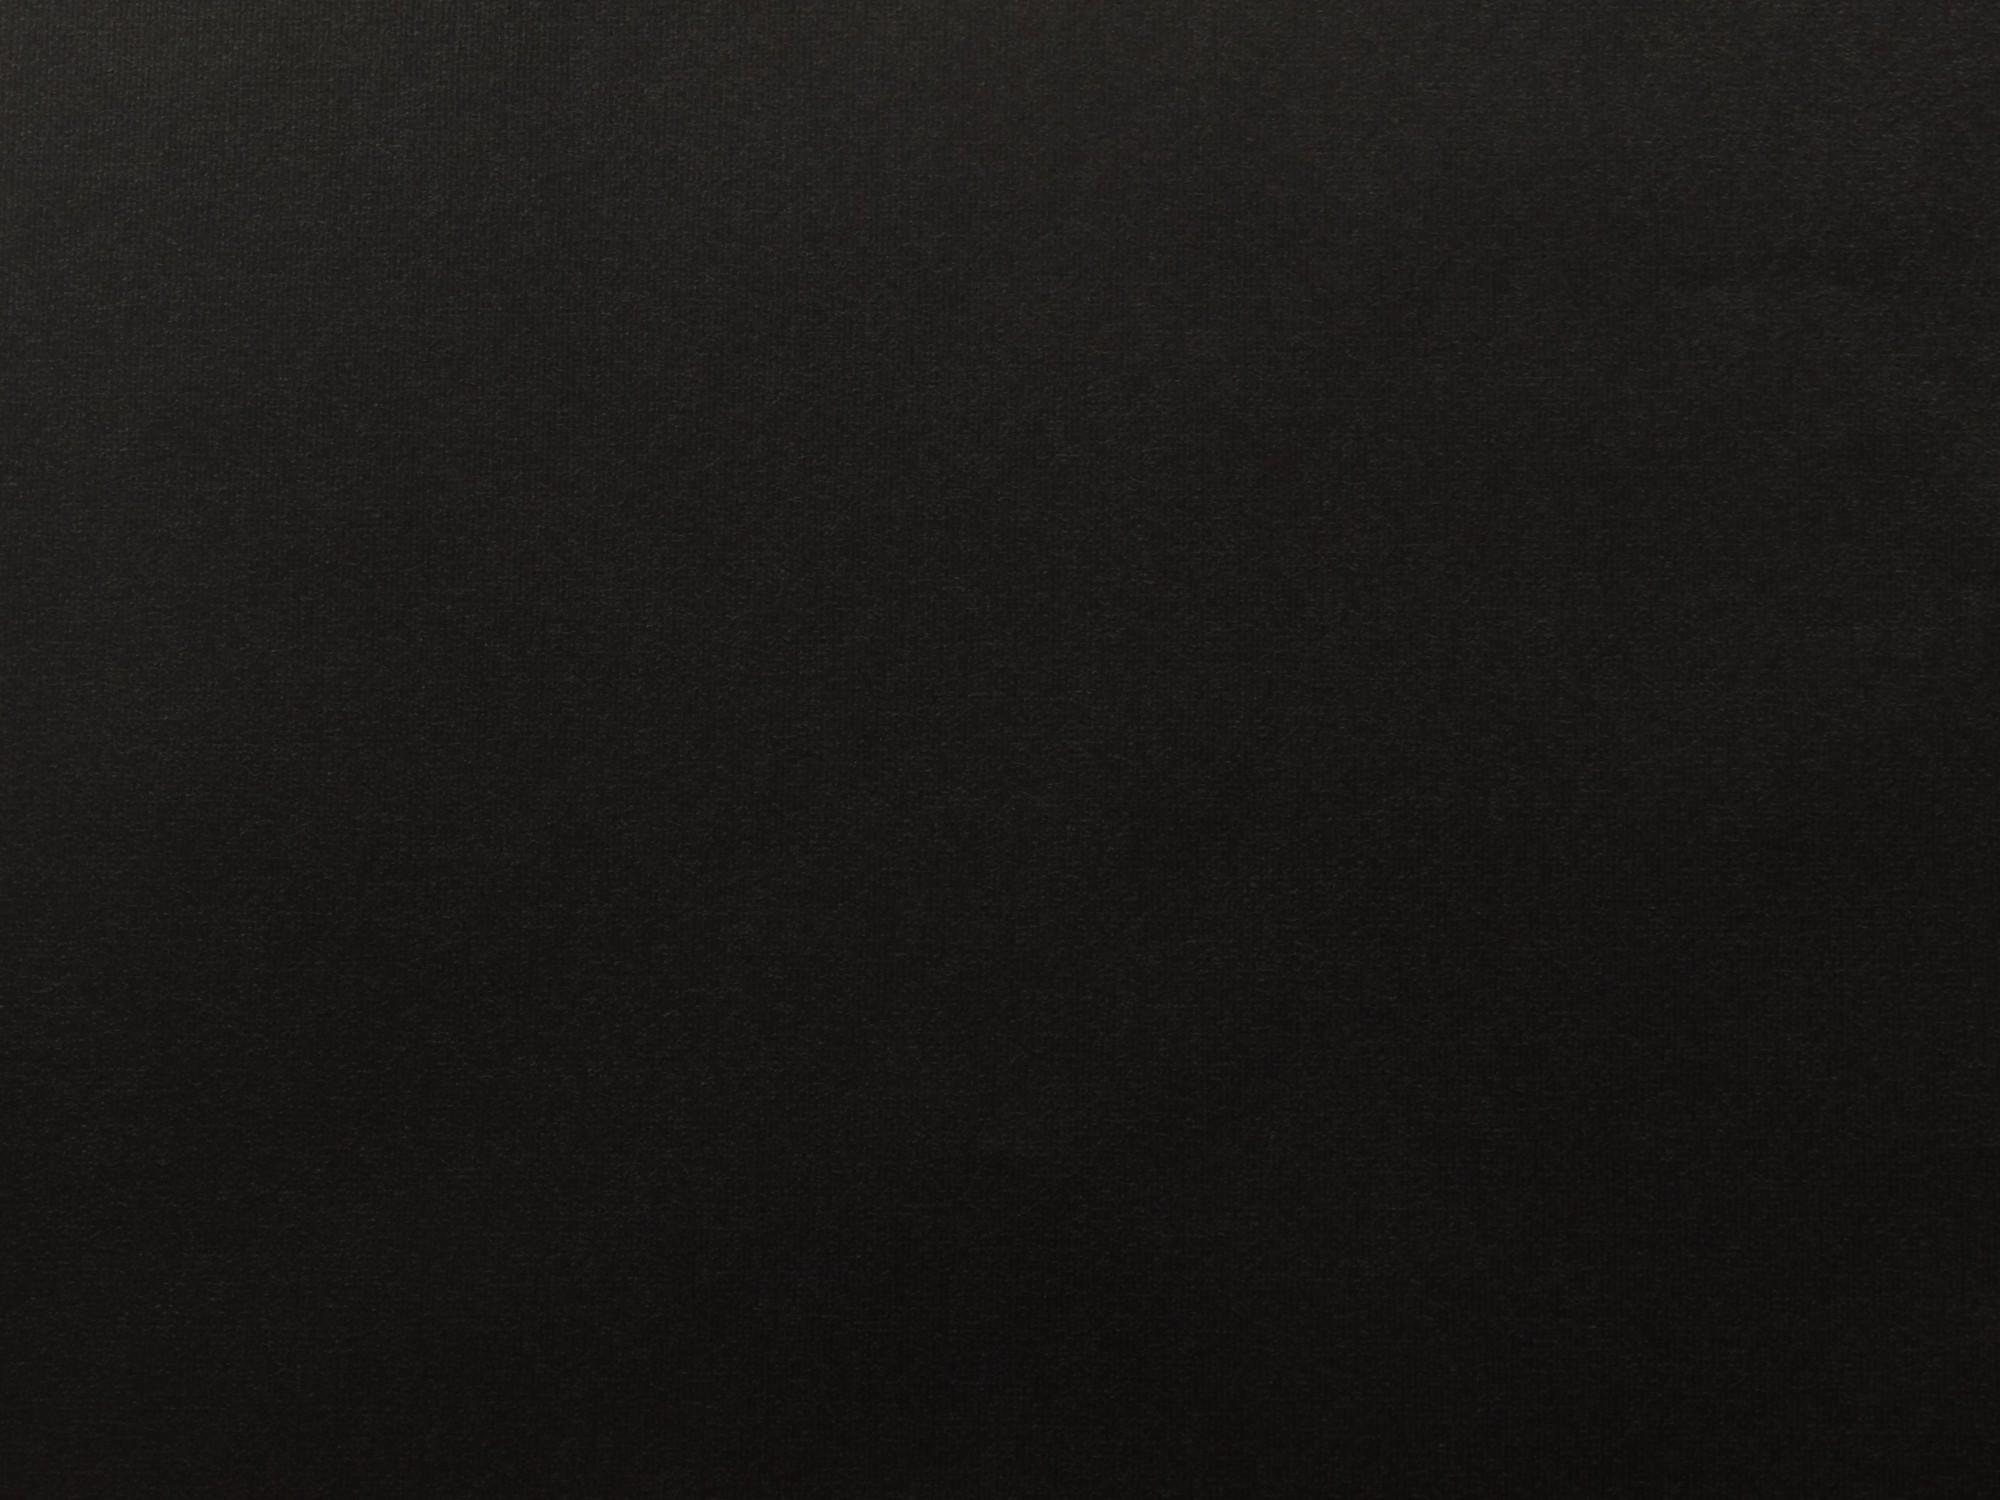 marburg designtapete karim rashid tapete 51945 uni schwarz. Black Bedroom Furniture Sets. Home Design Ideas